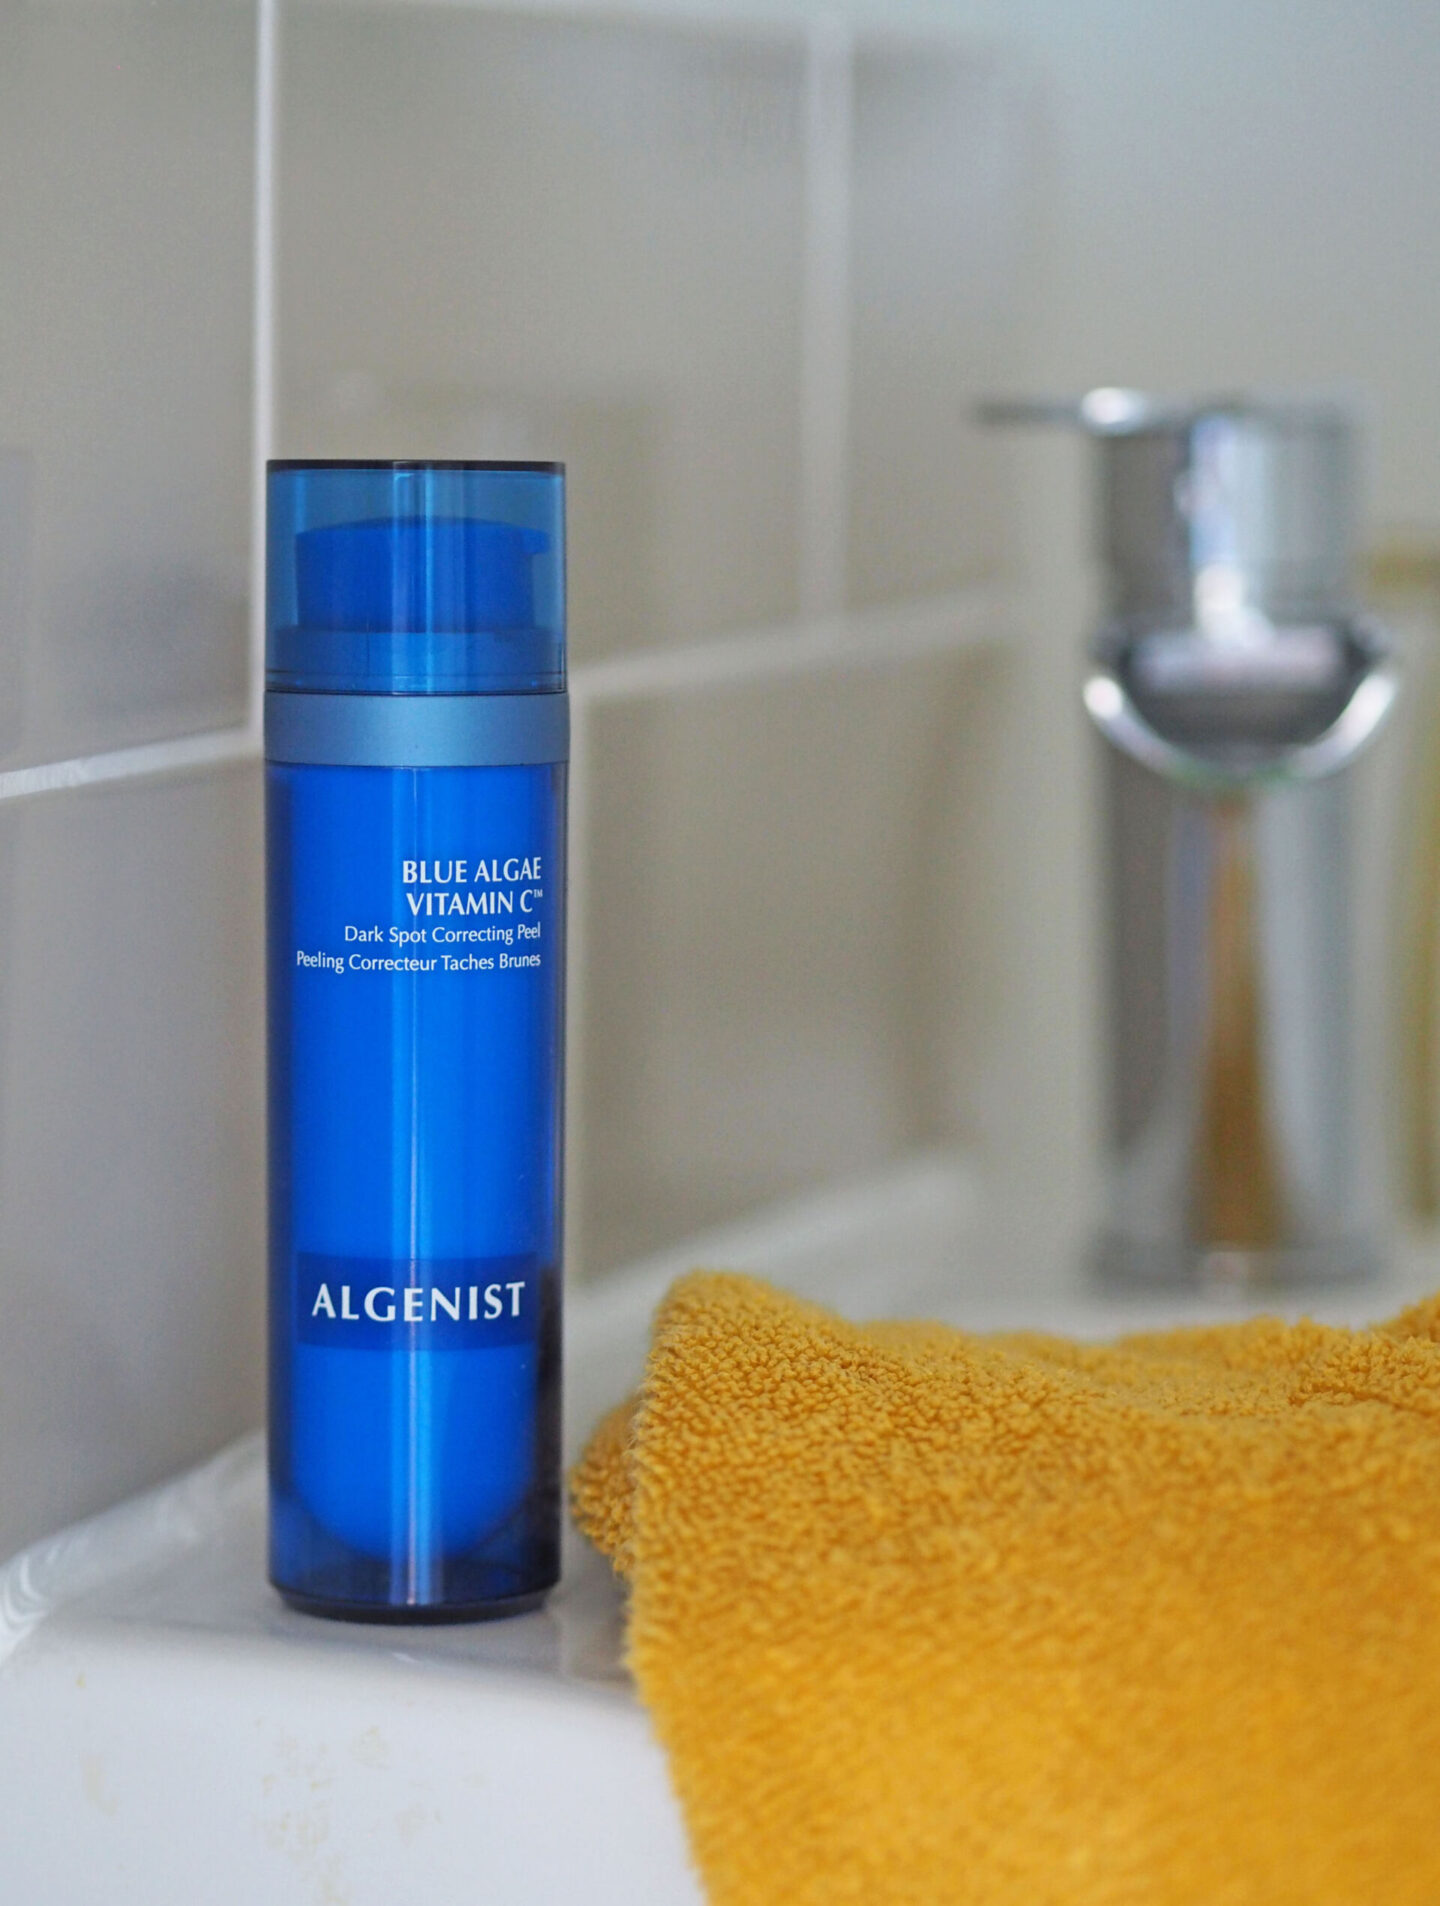 algenist blue algae vitamin c dark spot correcting peel